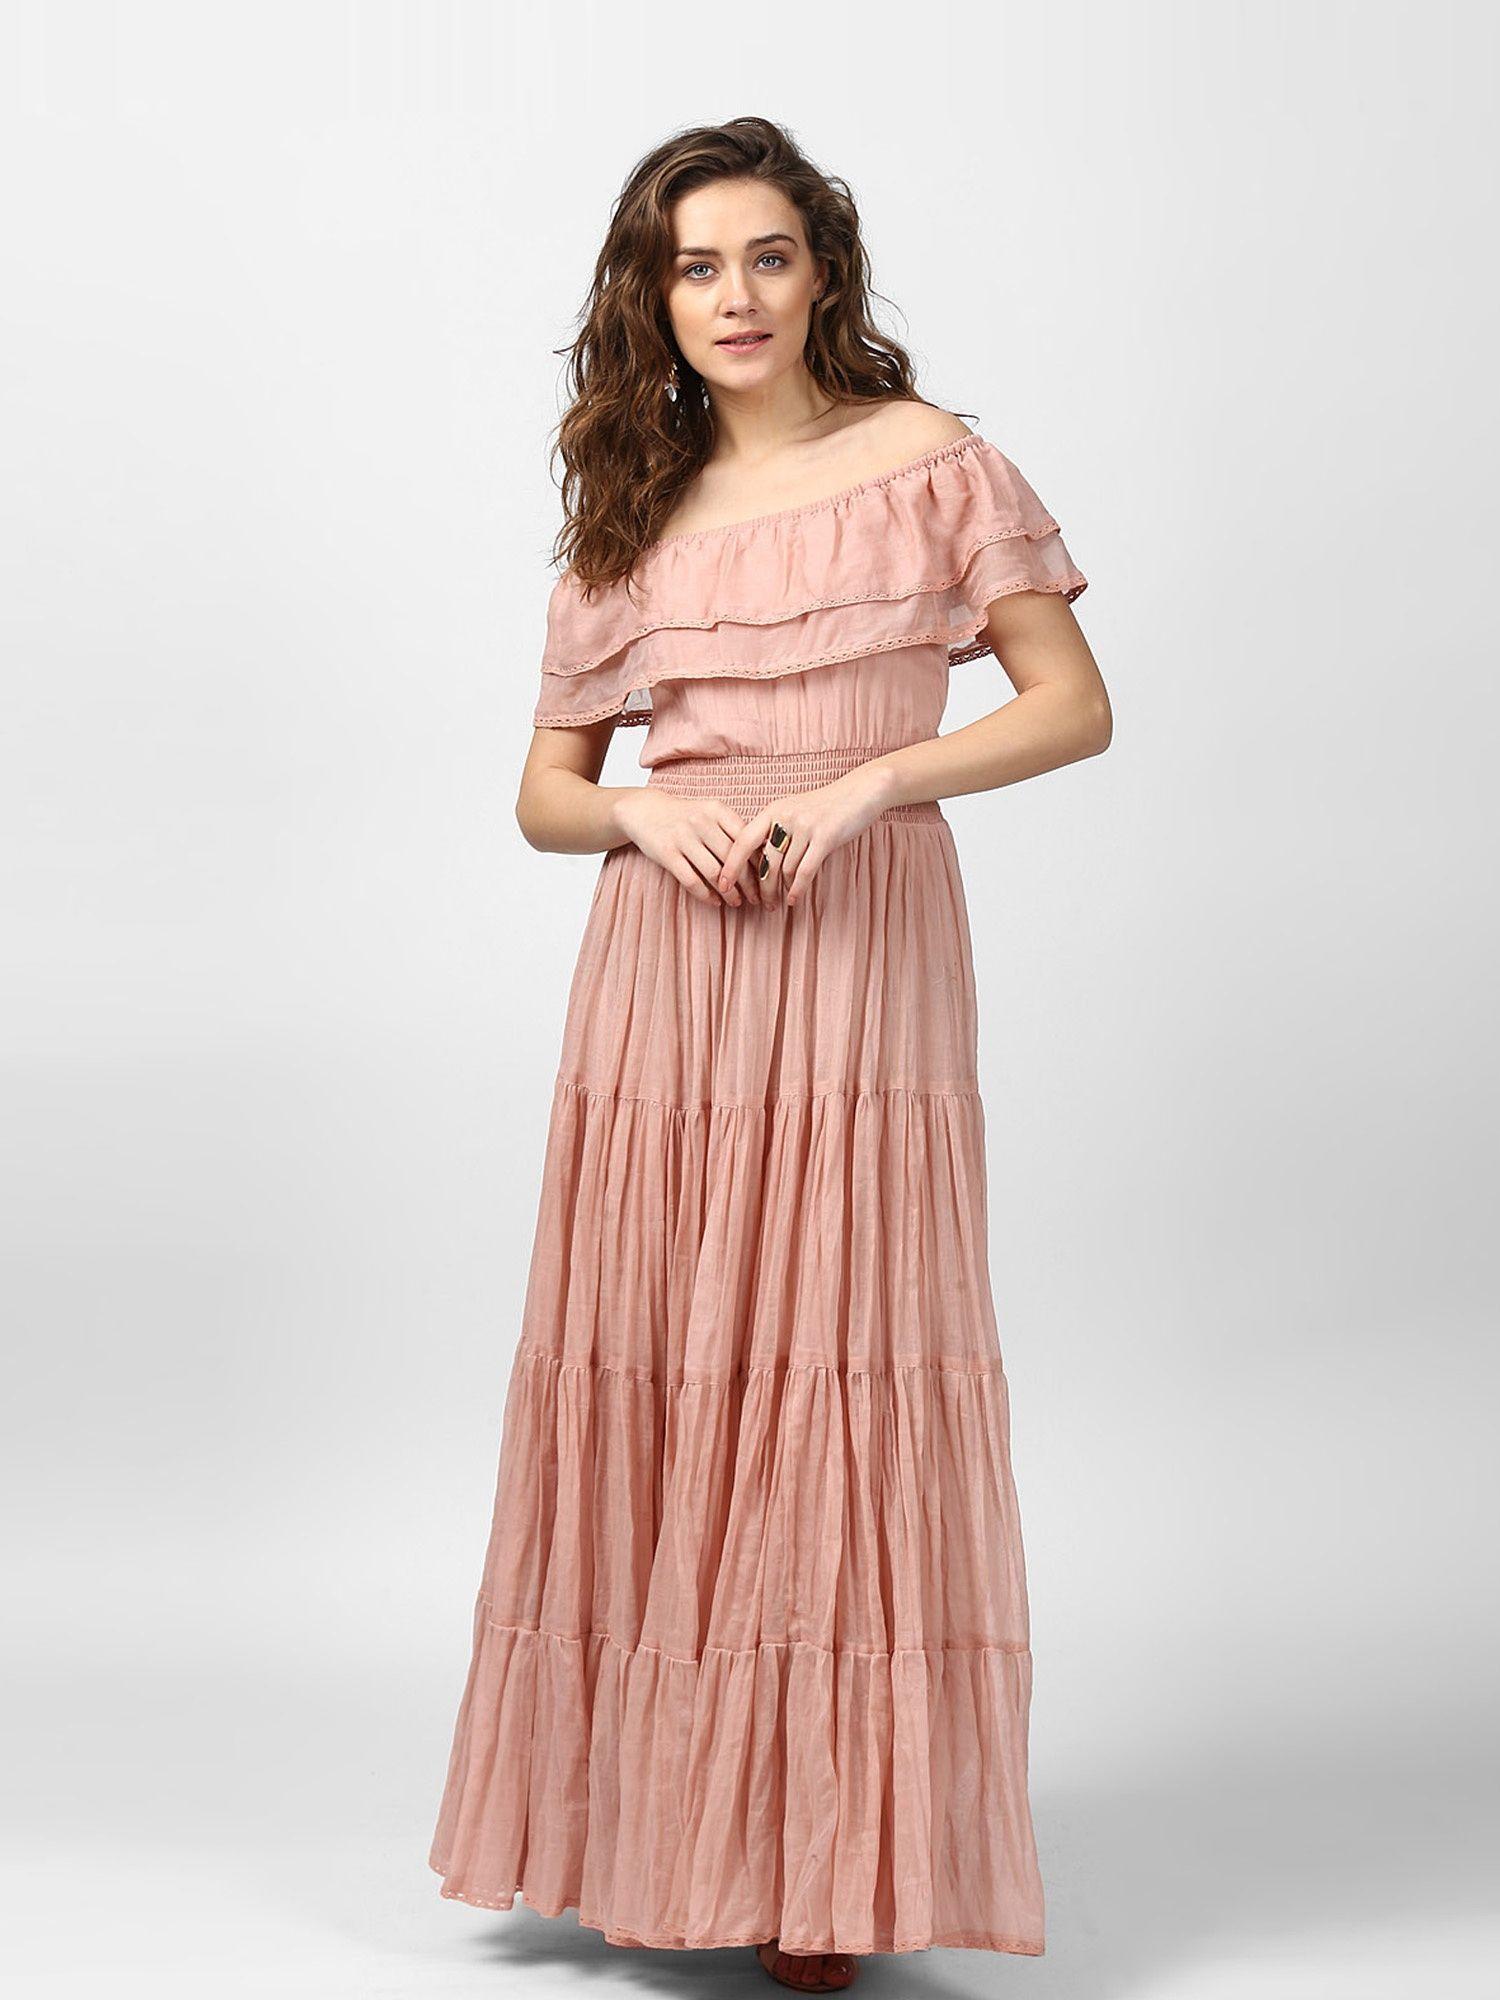 b2e50c8ae332 Label Ritu Kumar Dresses   Buy Label Ritu Kumar Off Shoulder Long Dress -  Pink Online